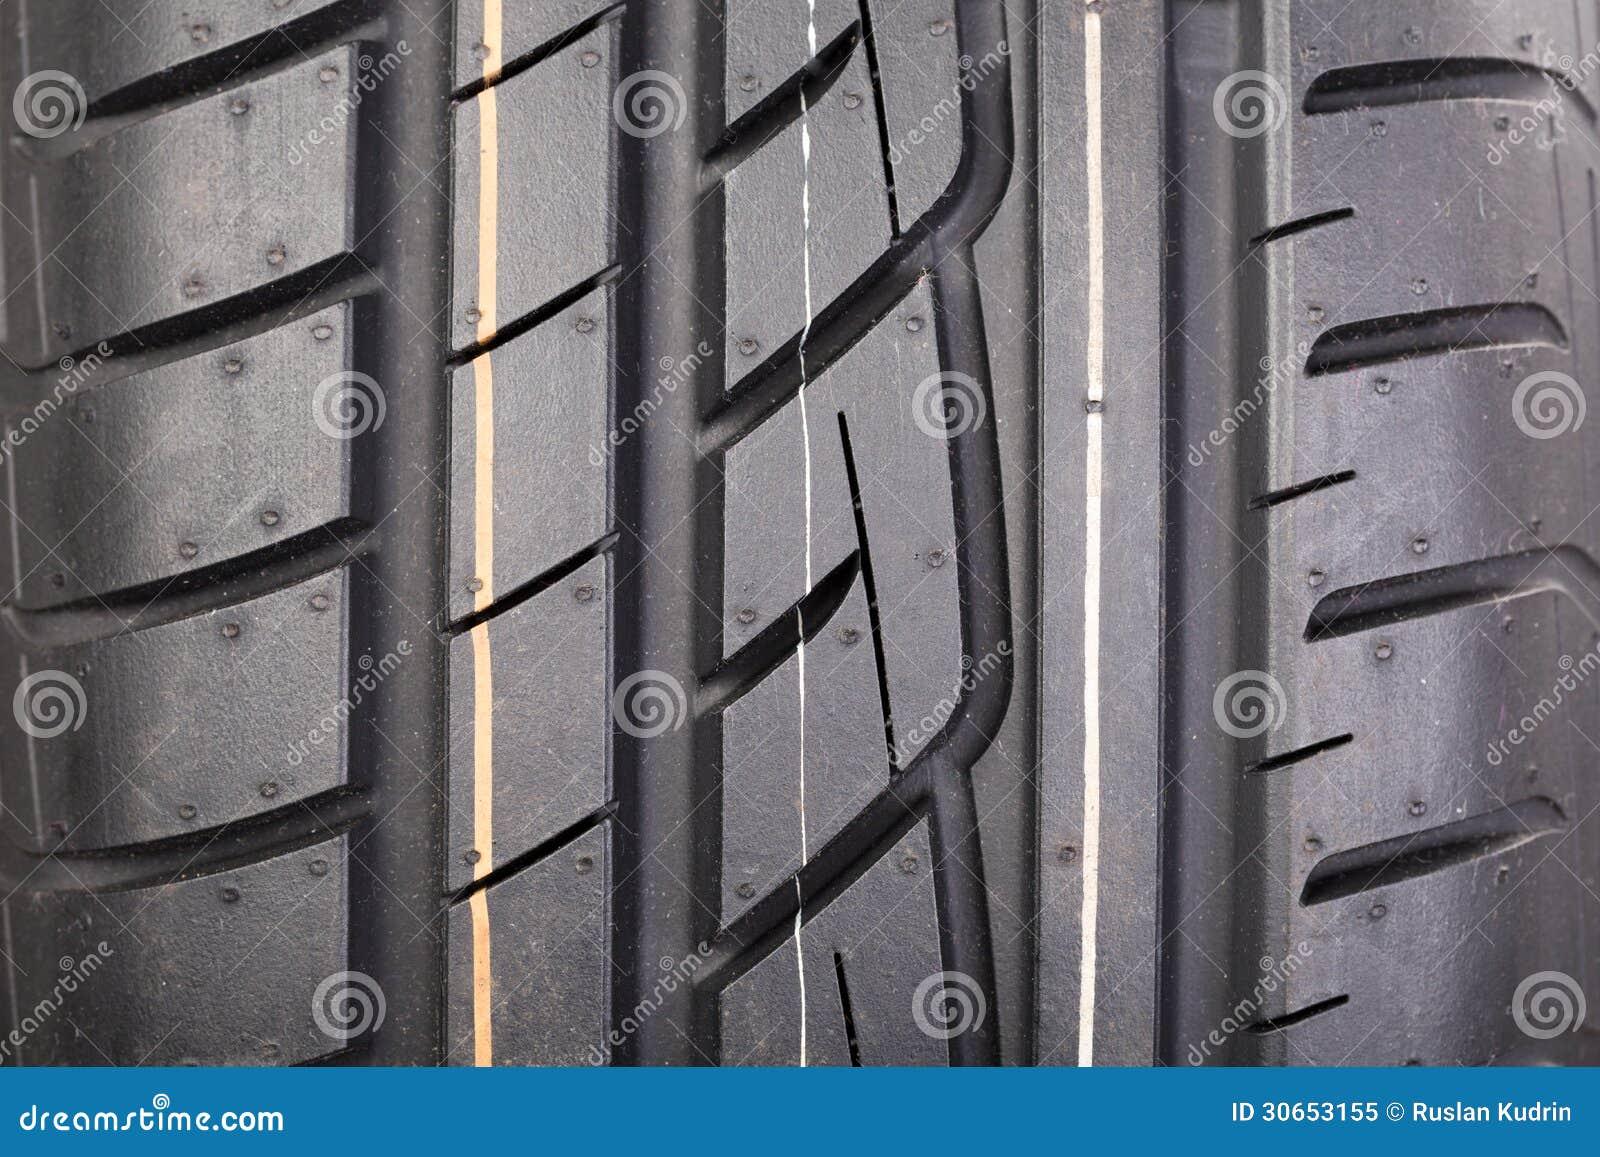 New tire tread royalty free stock photo image 30653155 - Tire tread wallpaper ...